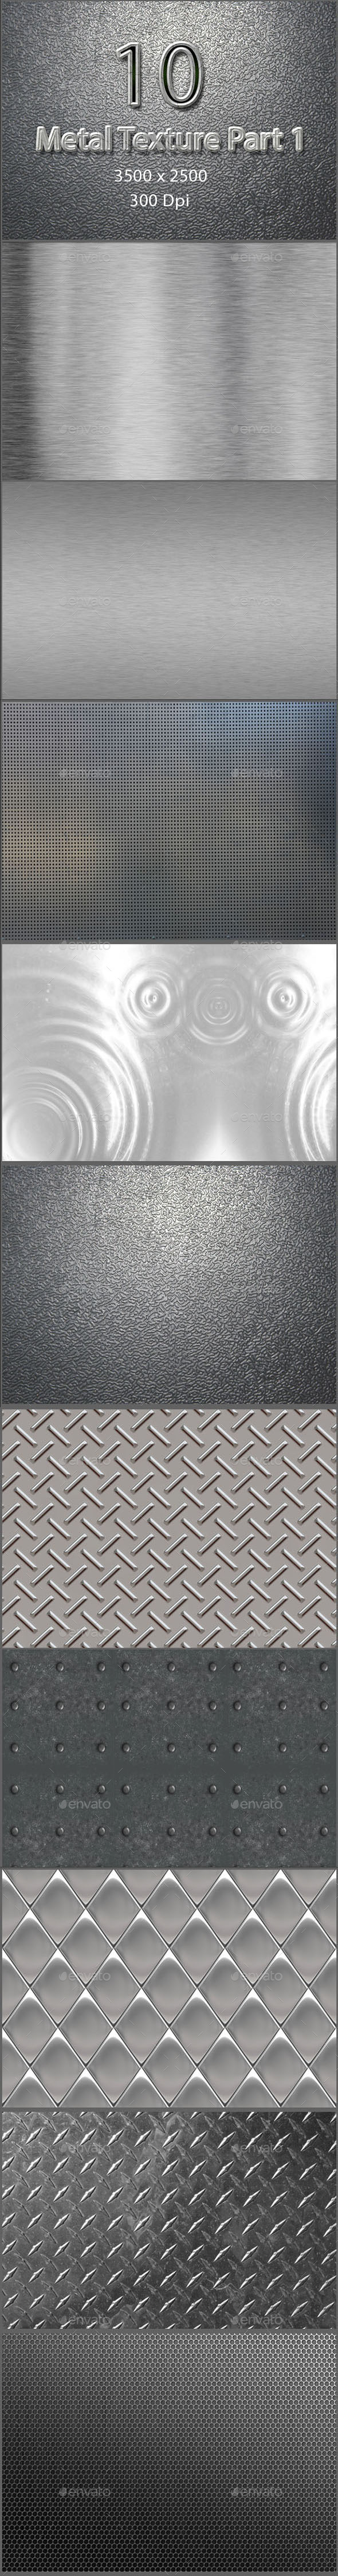 10 Metal Texture Part 1 - Metal Textures